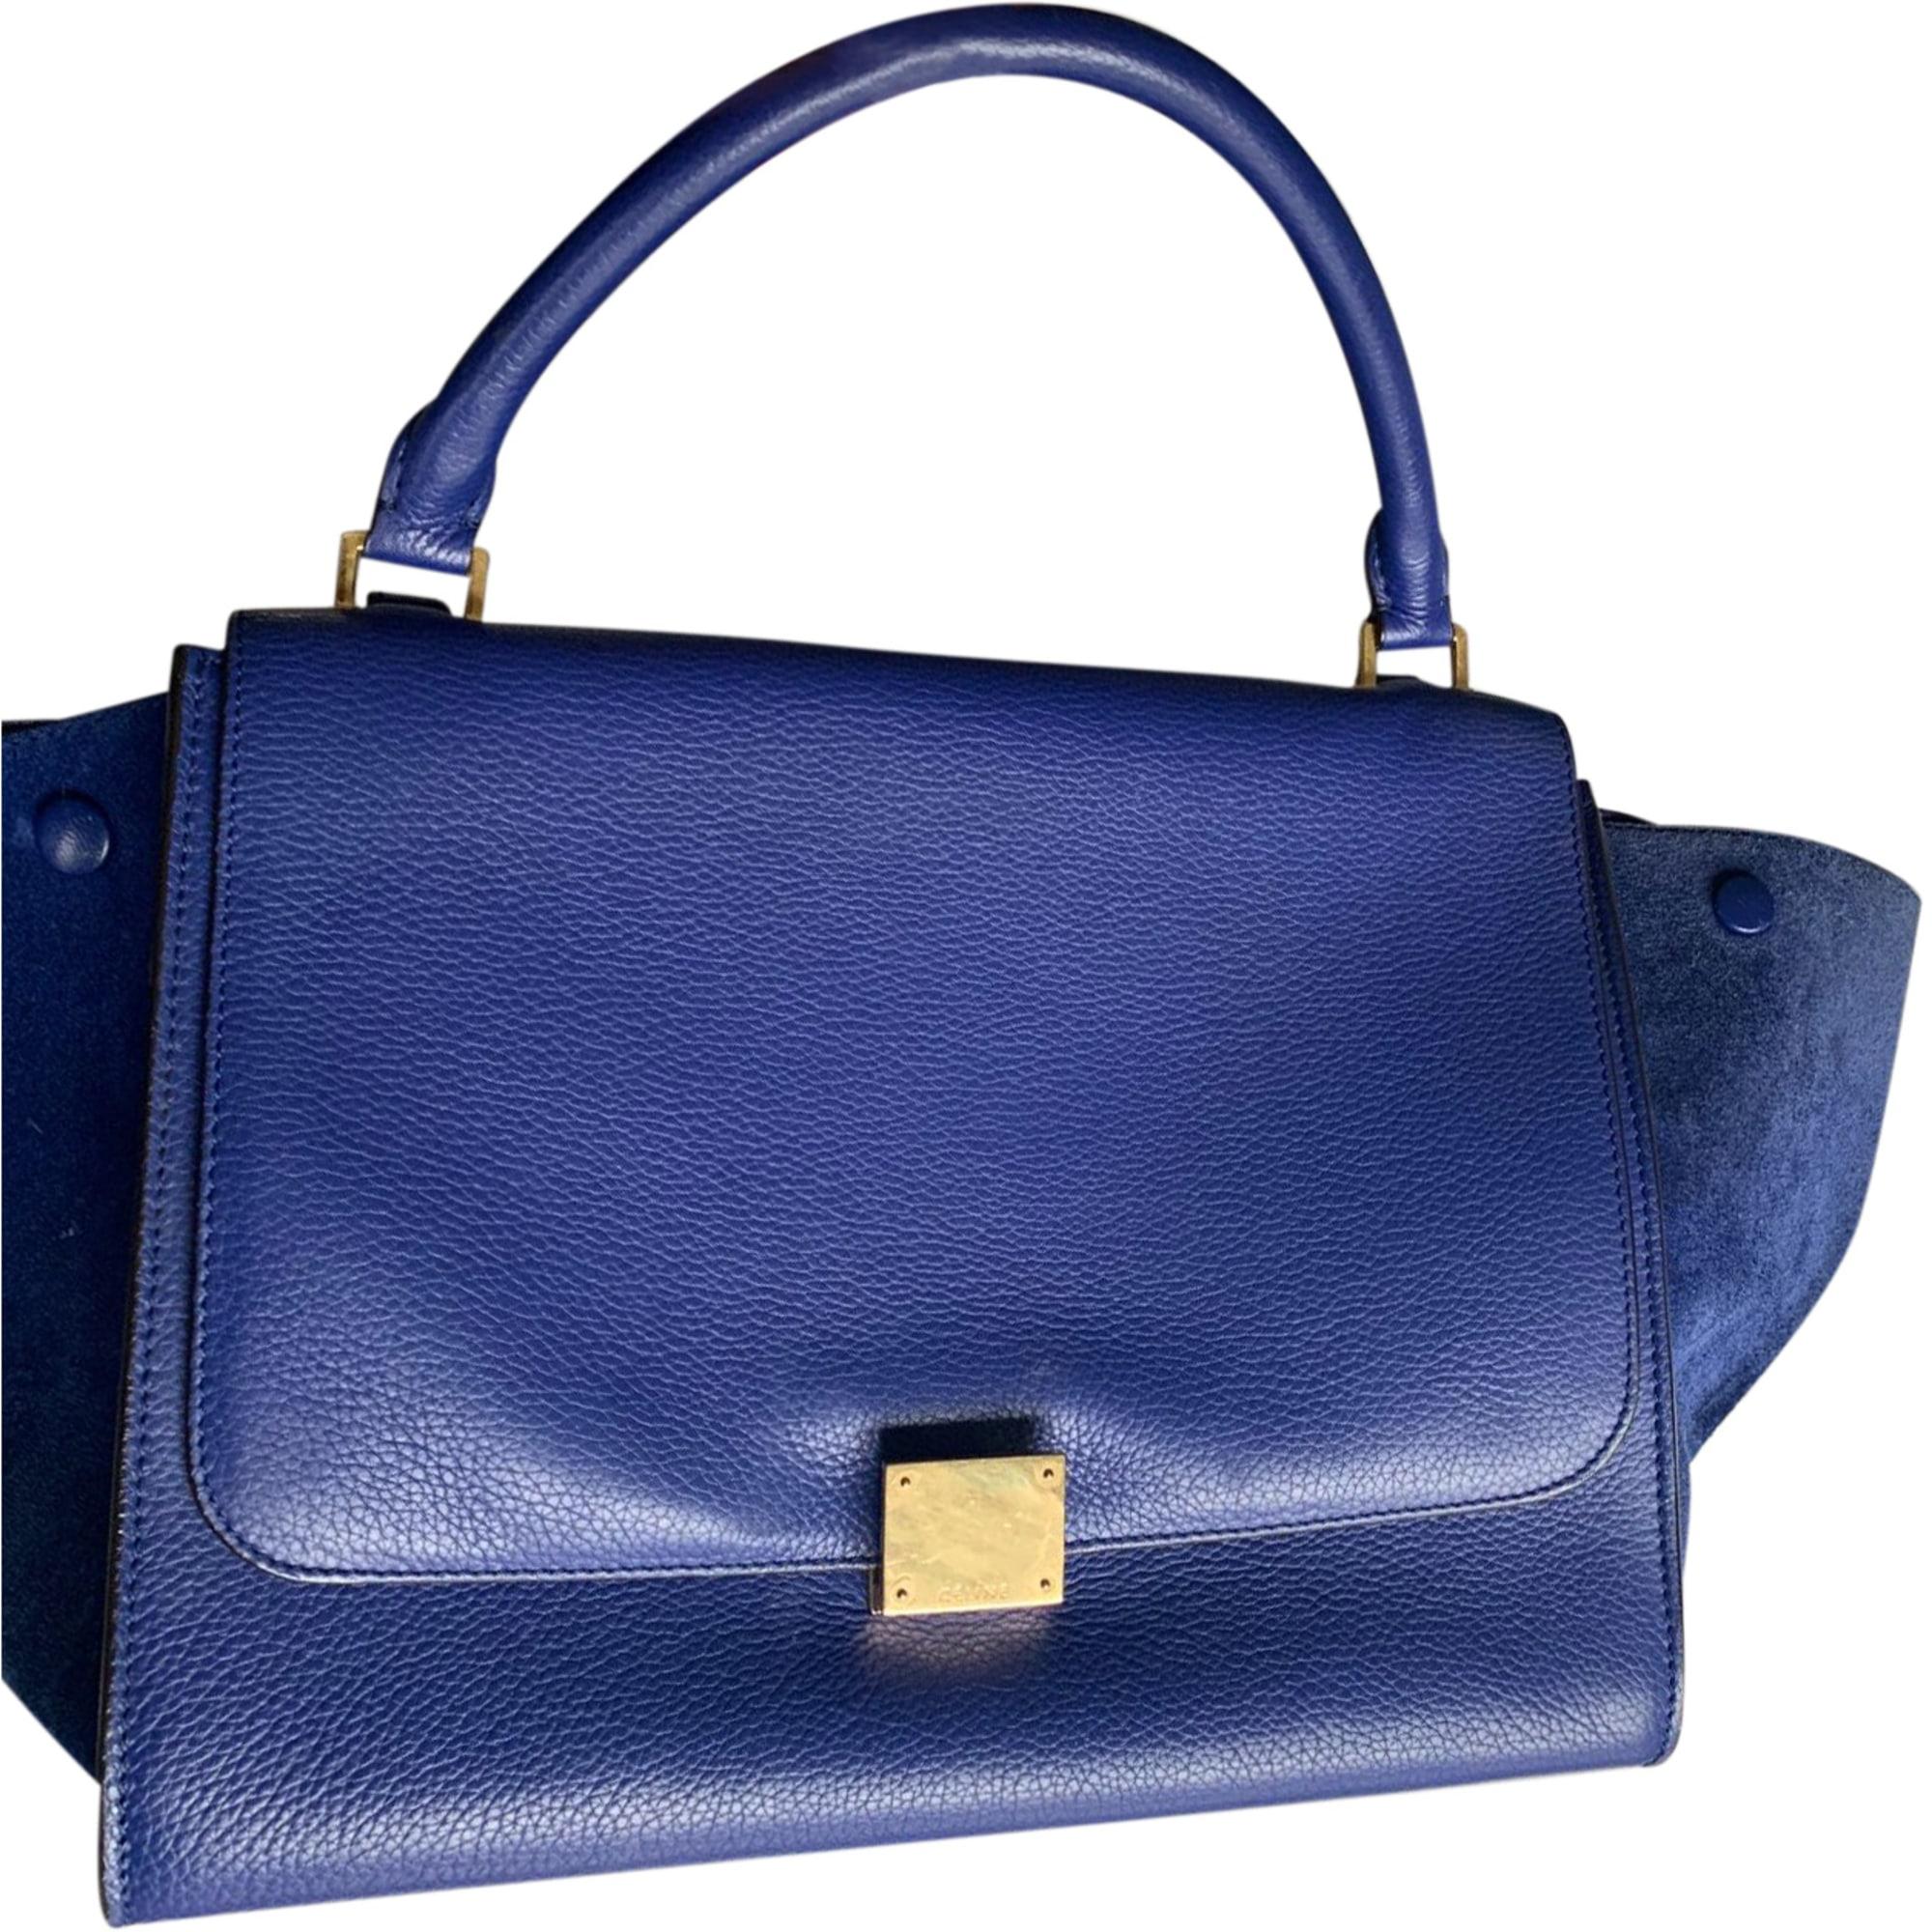 Sac à main en cuir CÉLINE Trapèze Bleu, bleu marine, bleu turquoise